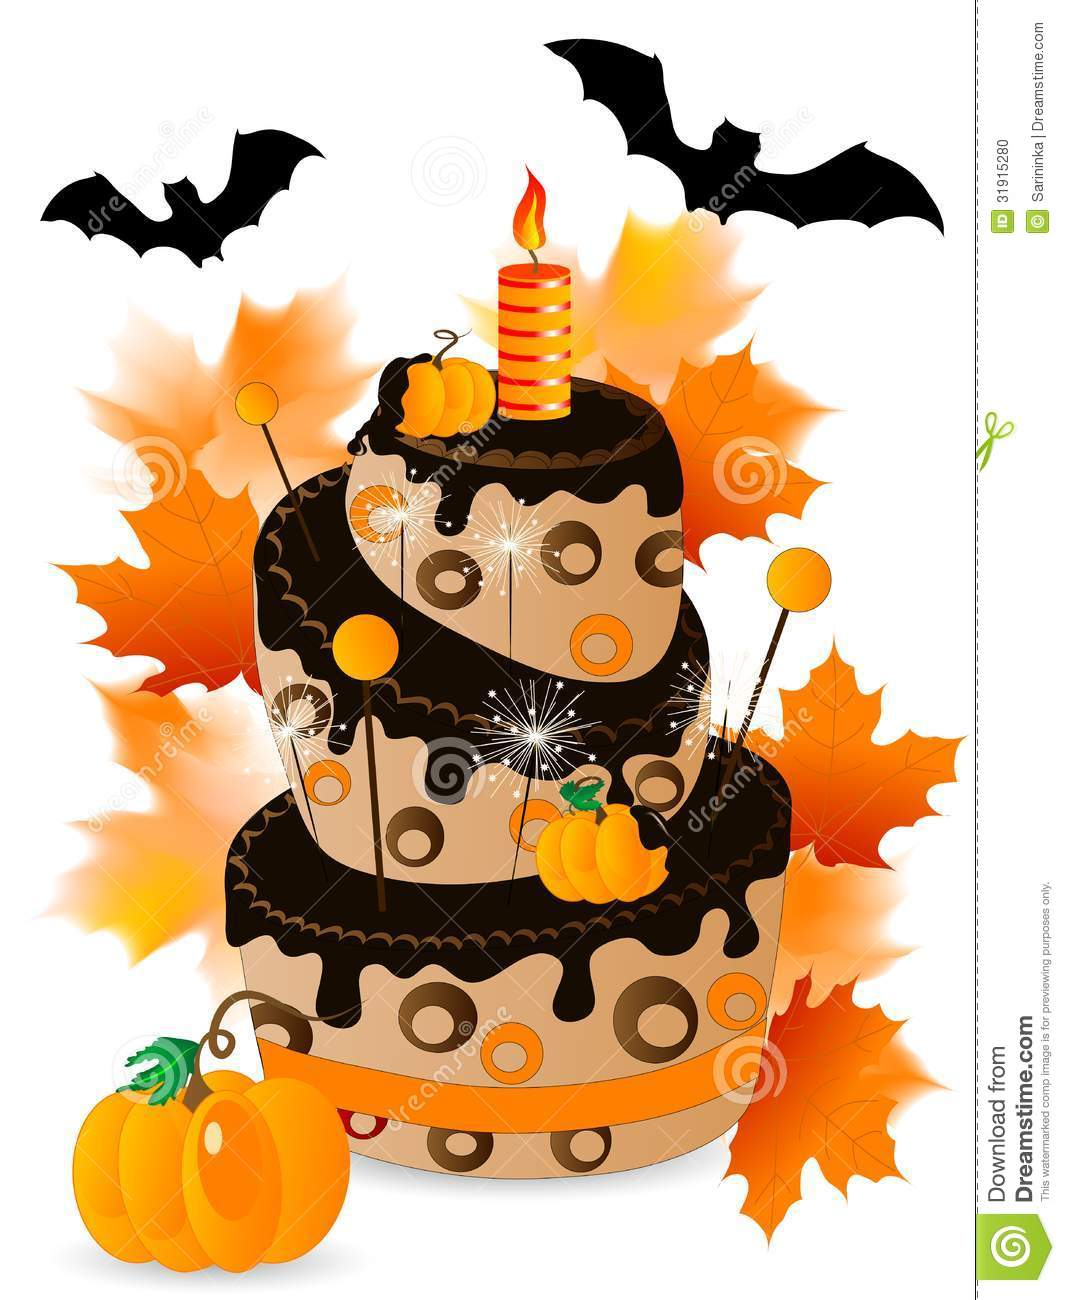 Halloween Birthday Cake Clipart.